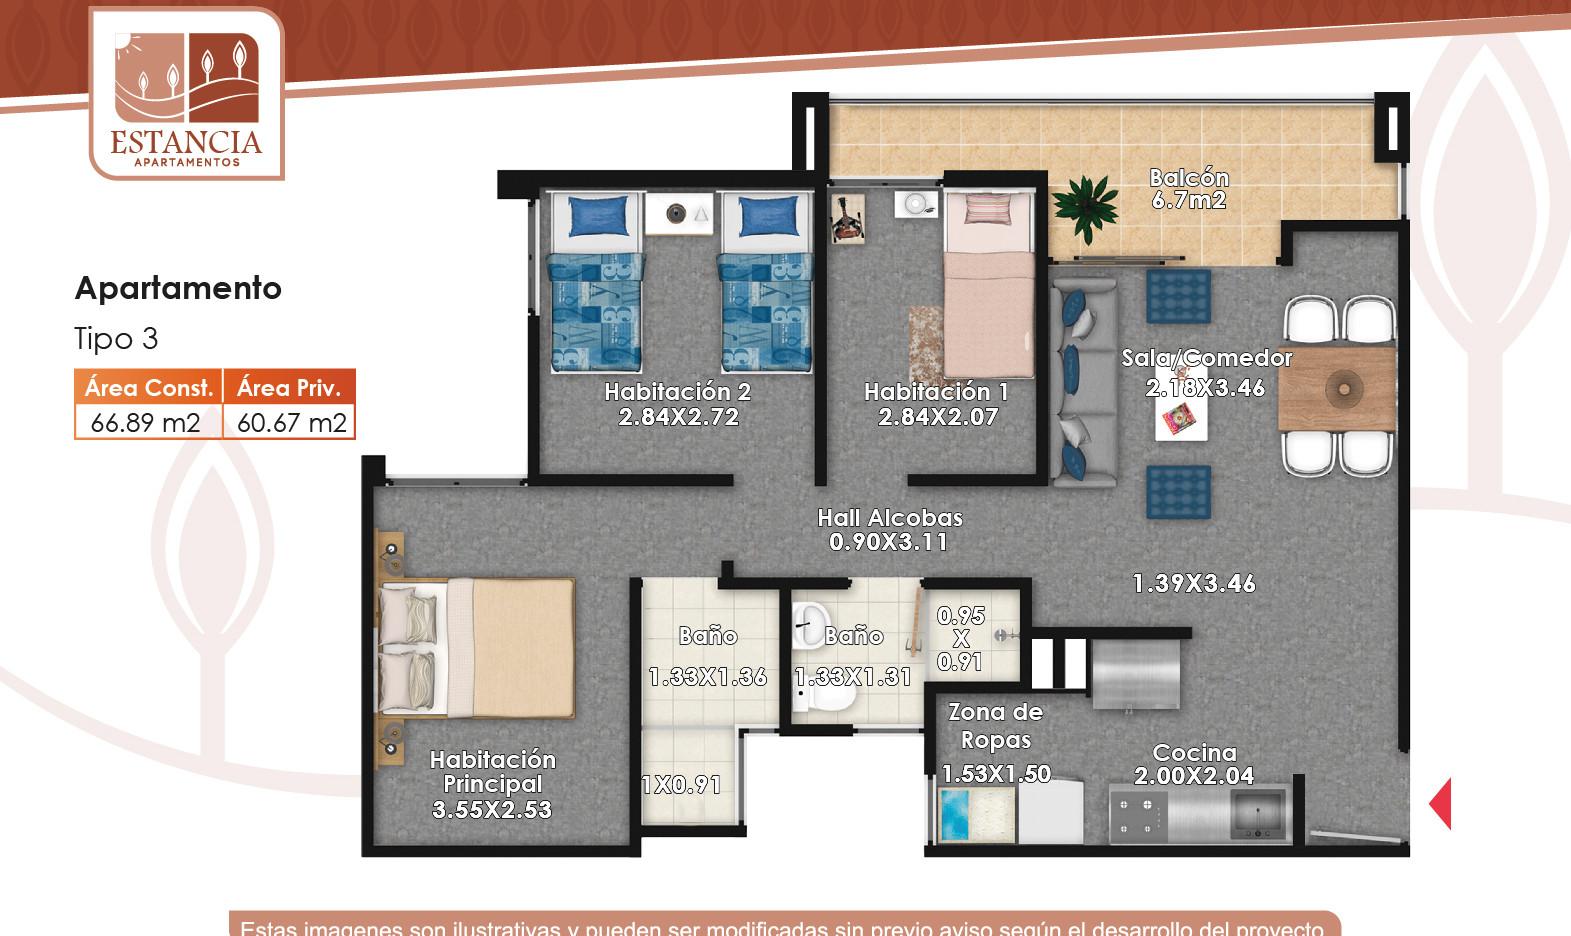 Apartamento Tipo 3